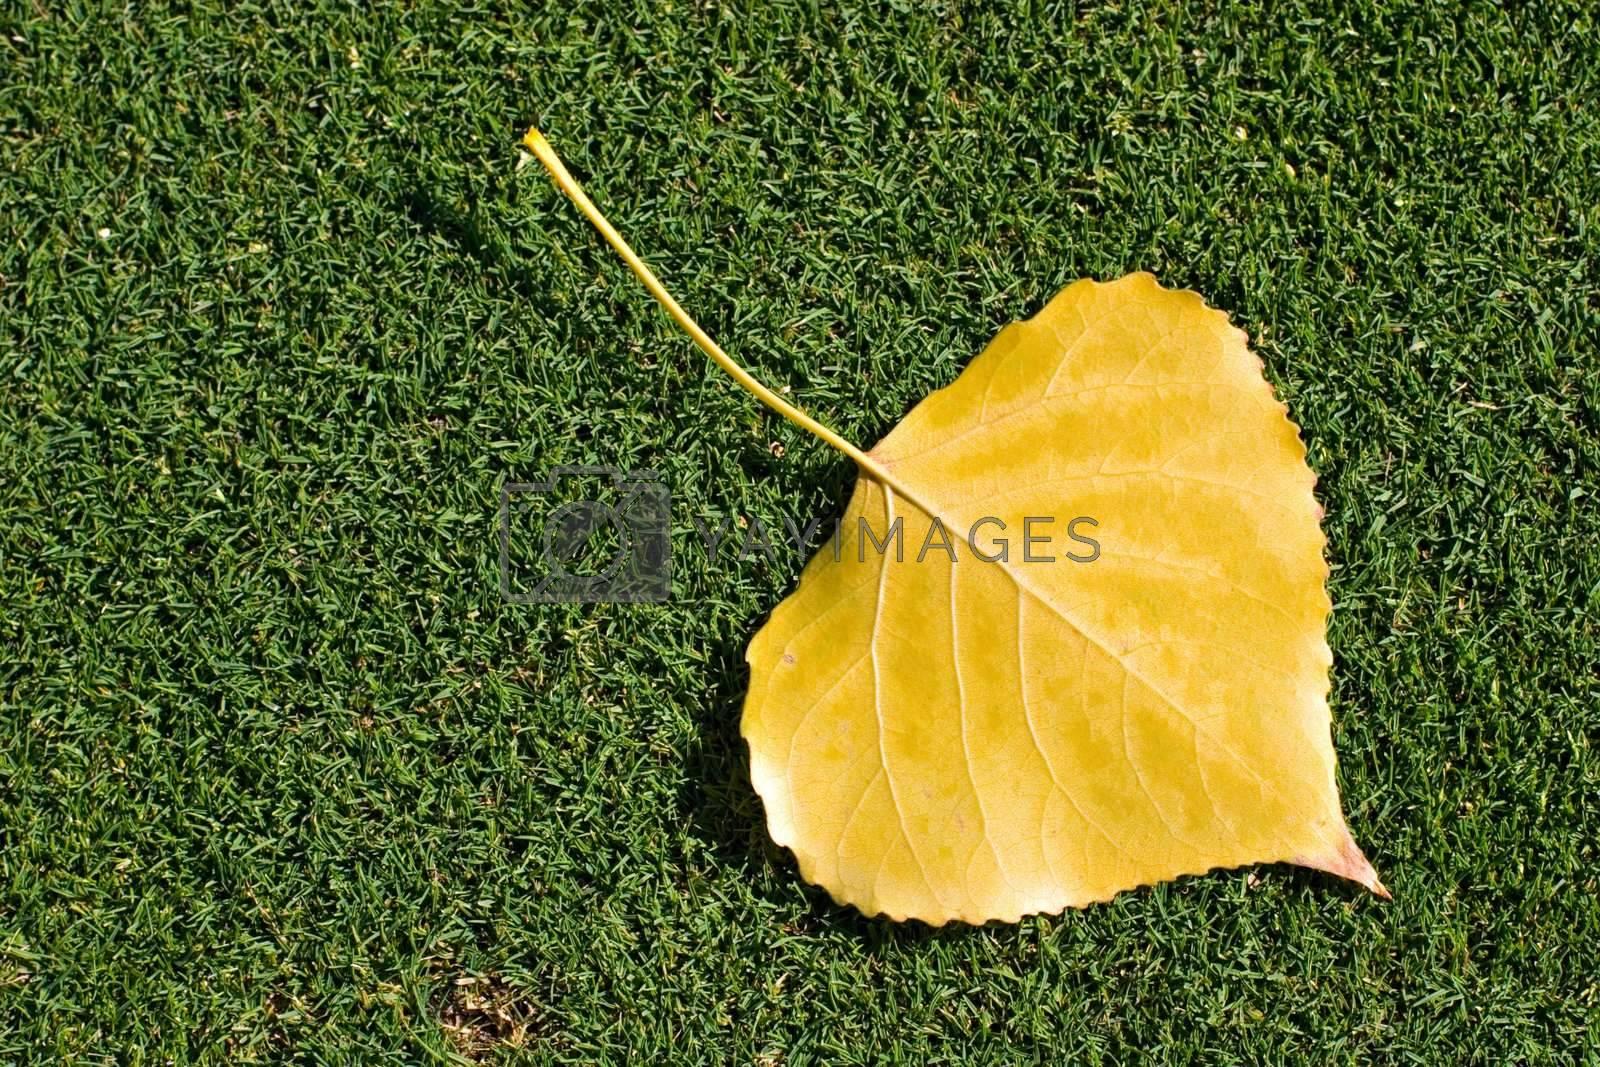 Yellow leaf fallen on grass